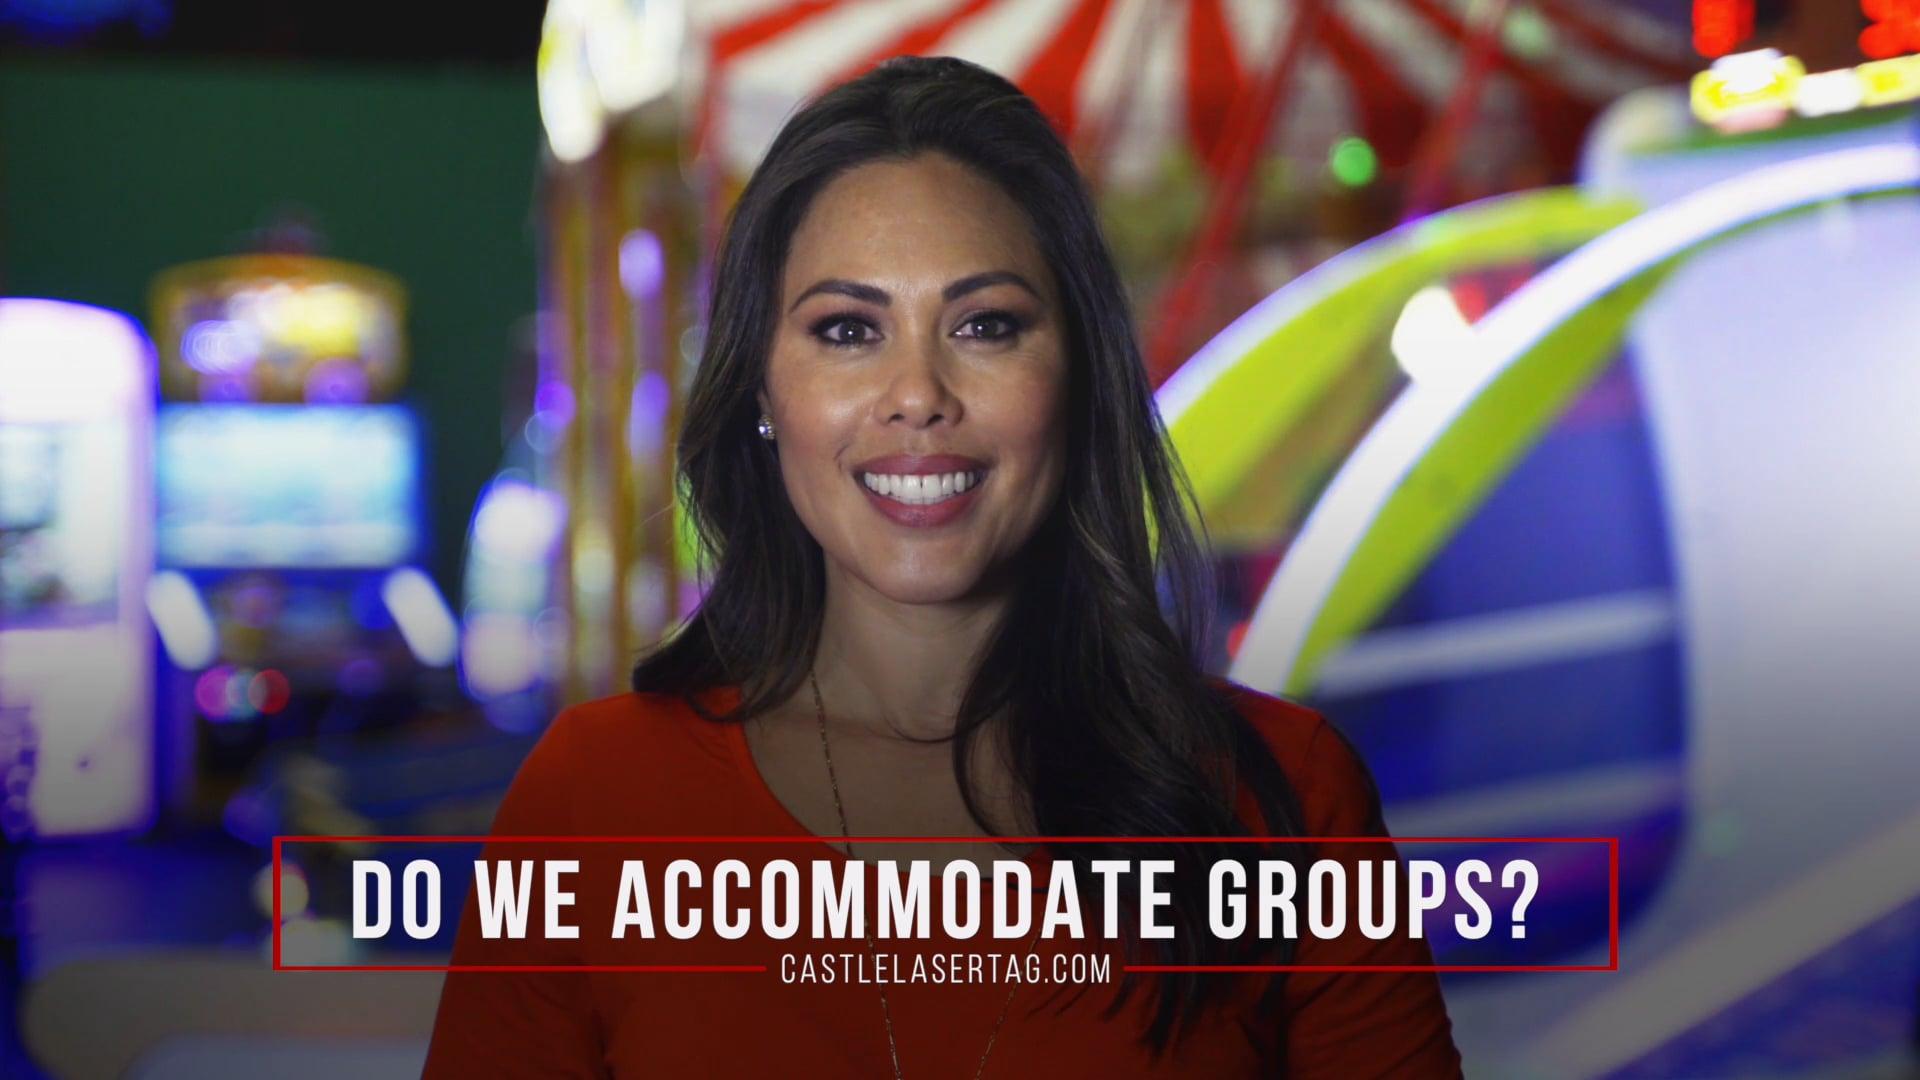 Do we accommodate groups?